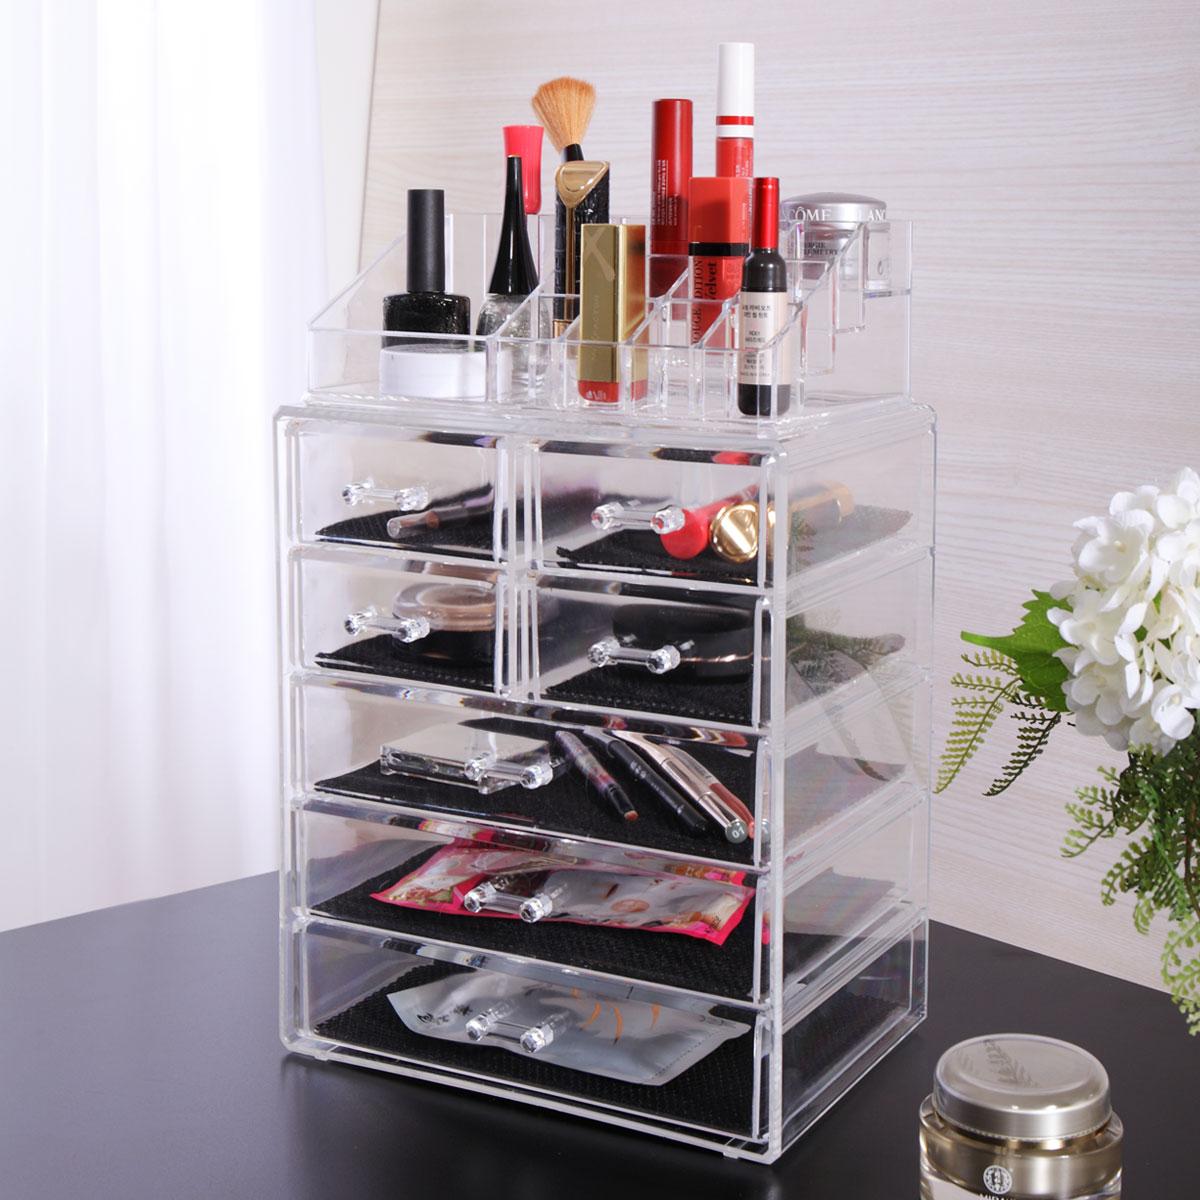 Jaxpety Acrylic Jewelry Cosmetic Organizer Makeup Case Display Holder Drawer Box Storage